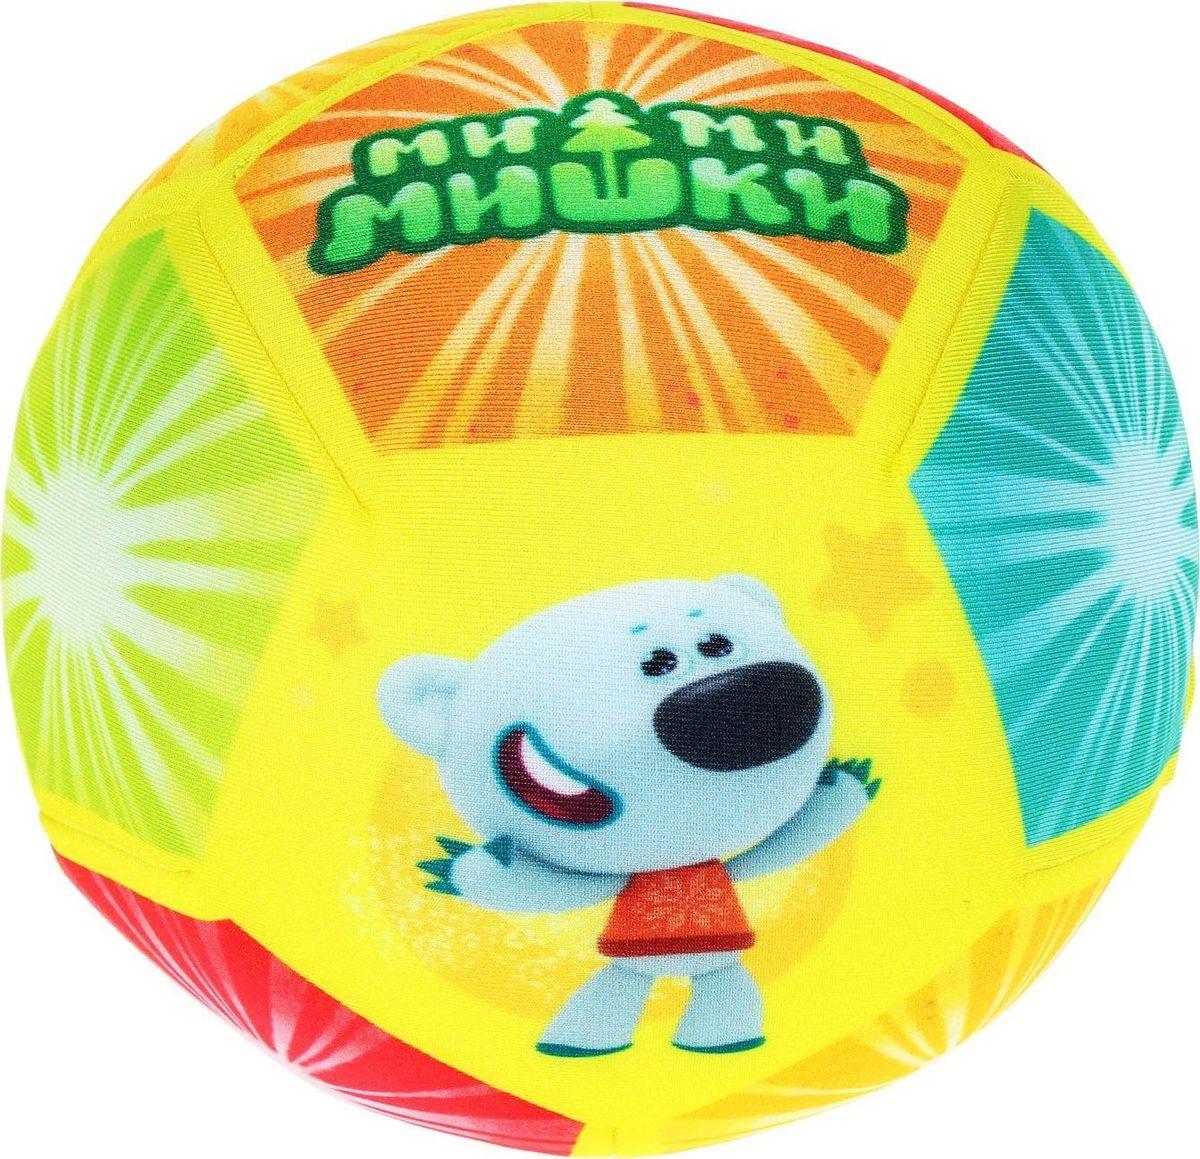 Sima-land Антистрессовая игрушка Мяч sima land мягкая игрушка антистресс губы целовашки 864936